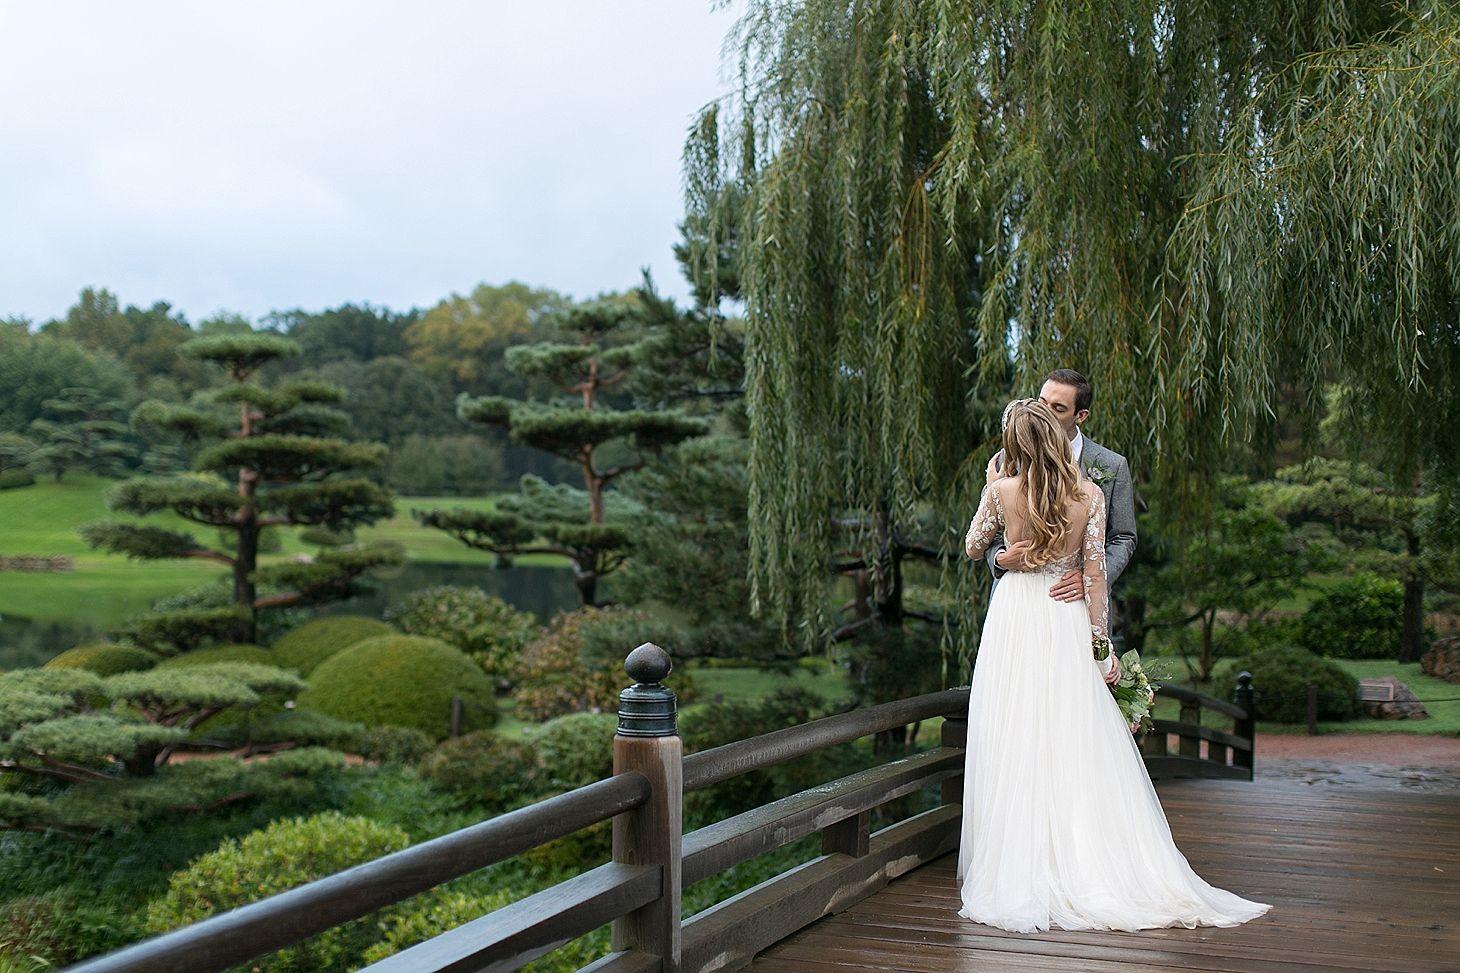 chicago-botanic-garden-wedding-by-christy-tyler-photography_0037